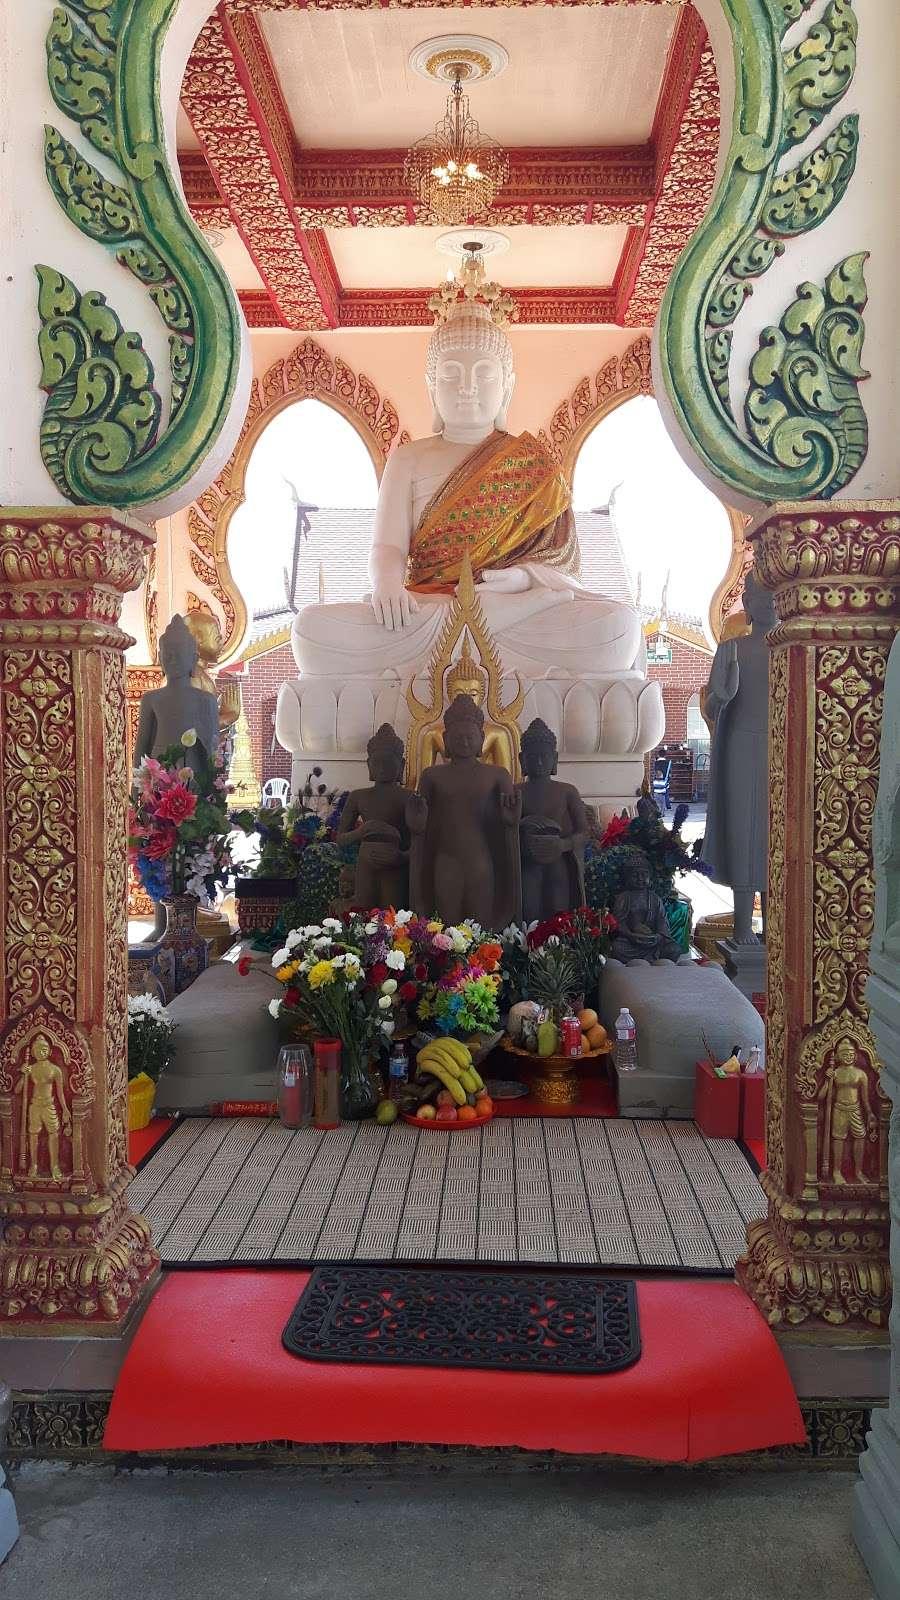 Cambodia Buddhist - museum  | Photo 3 of 10 | Address: 5701 Crystal Lake Blvd, Dallas, TX 75236, USA